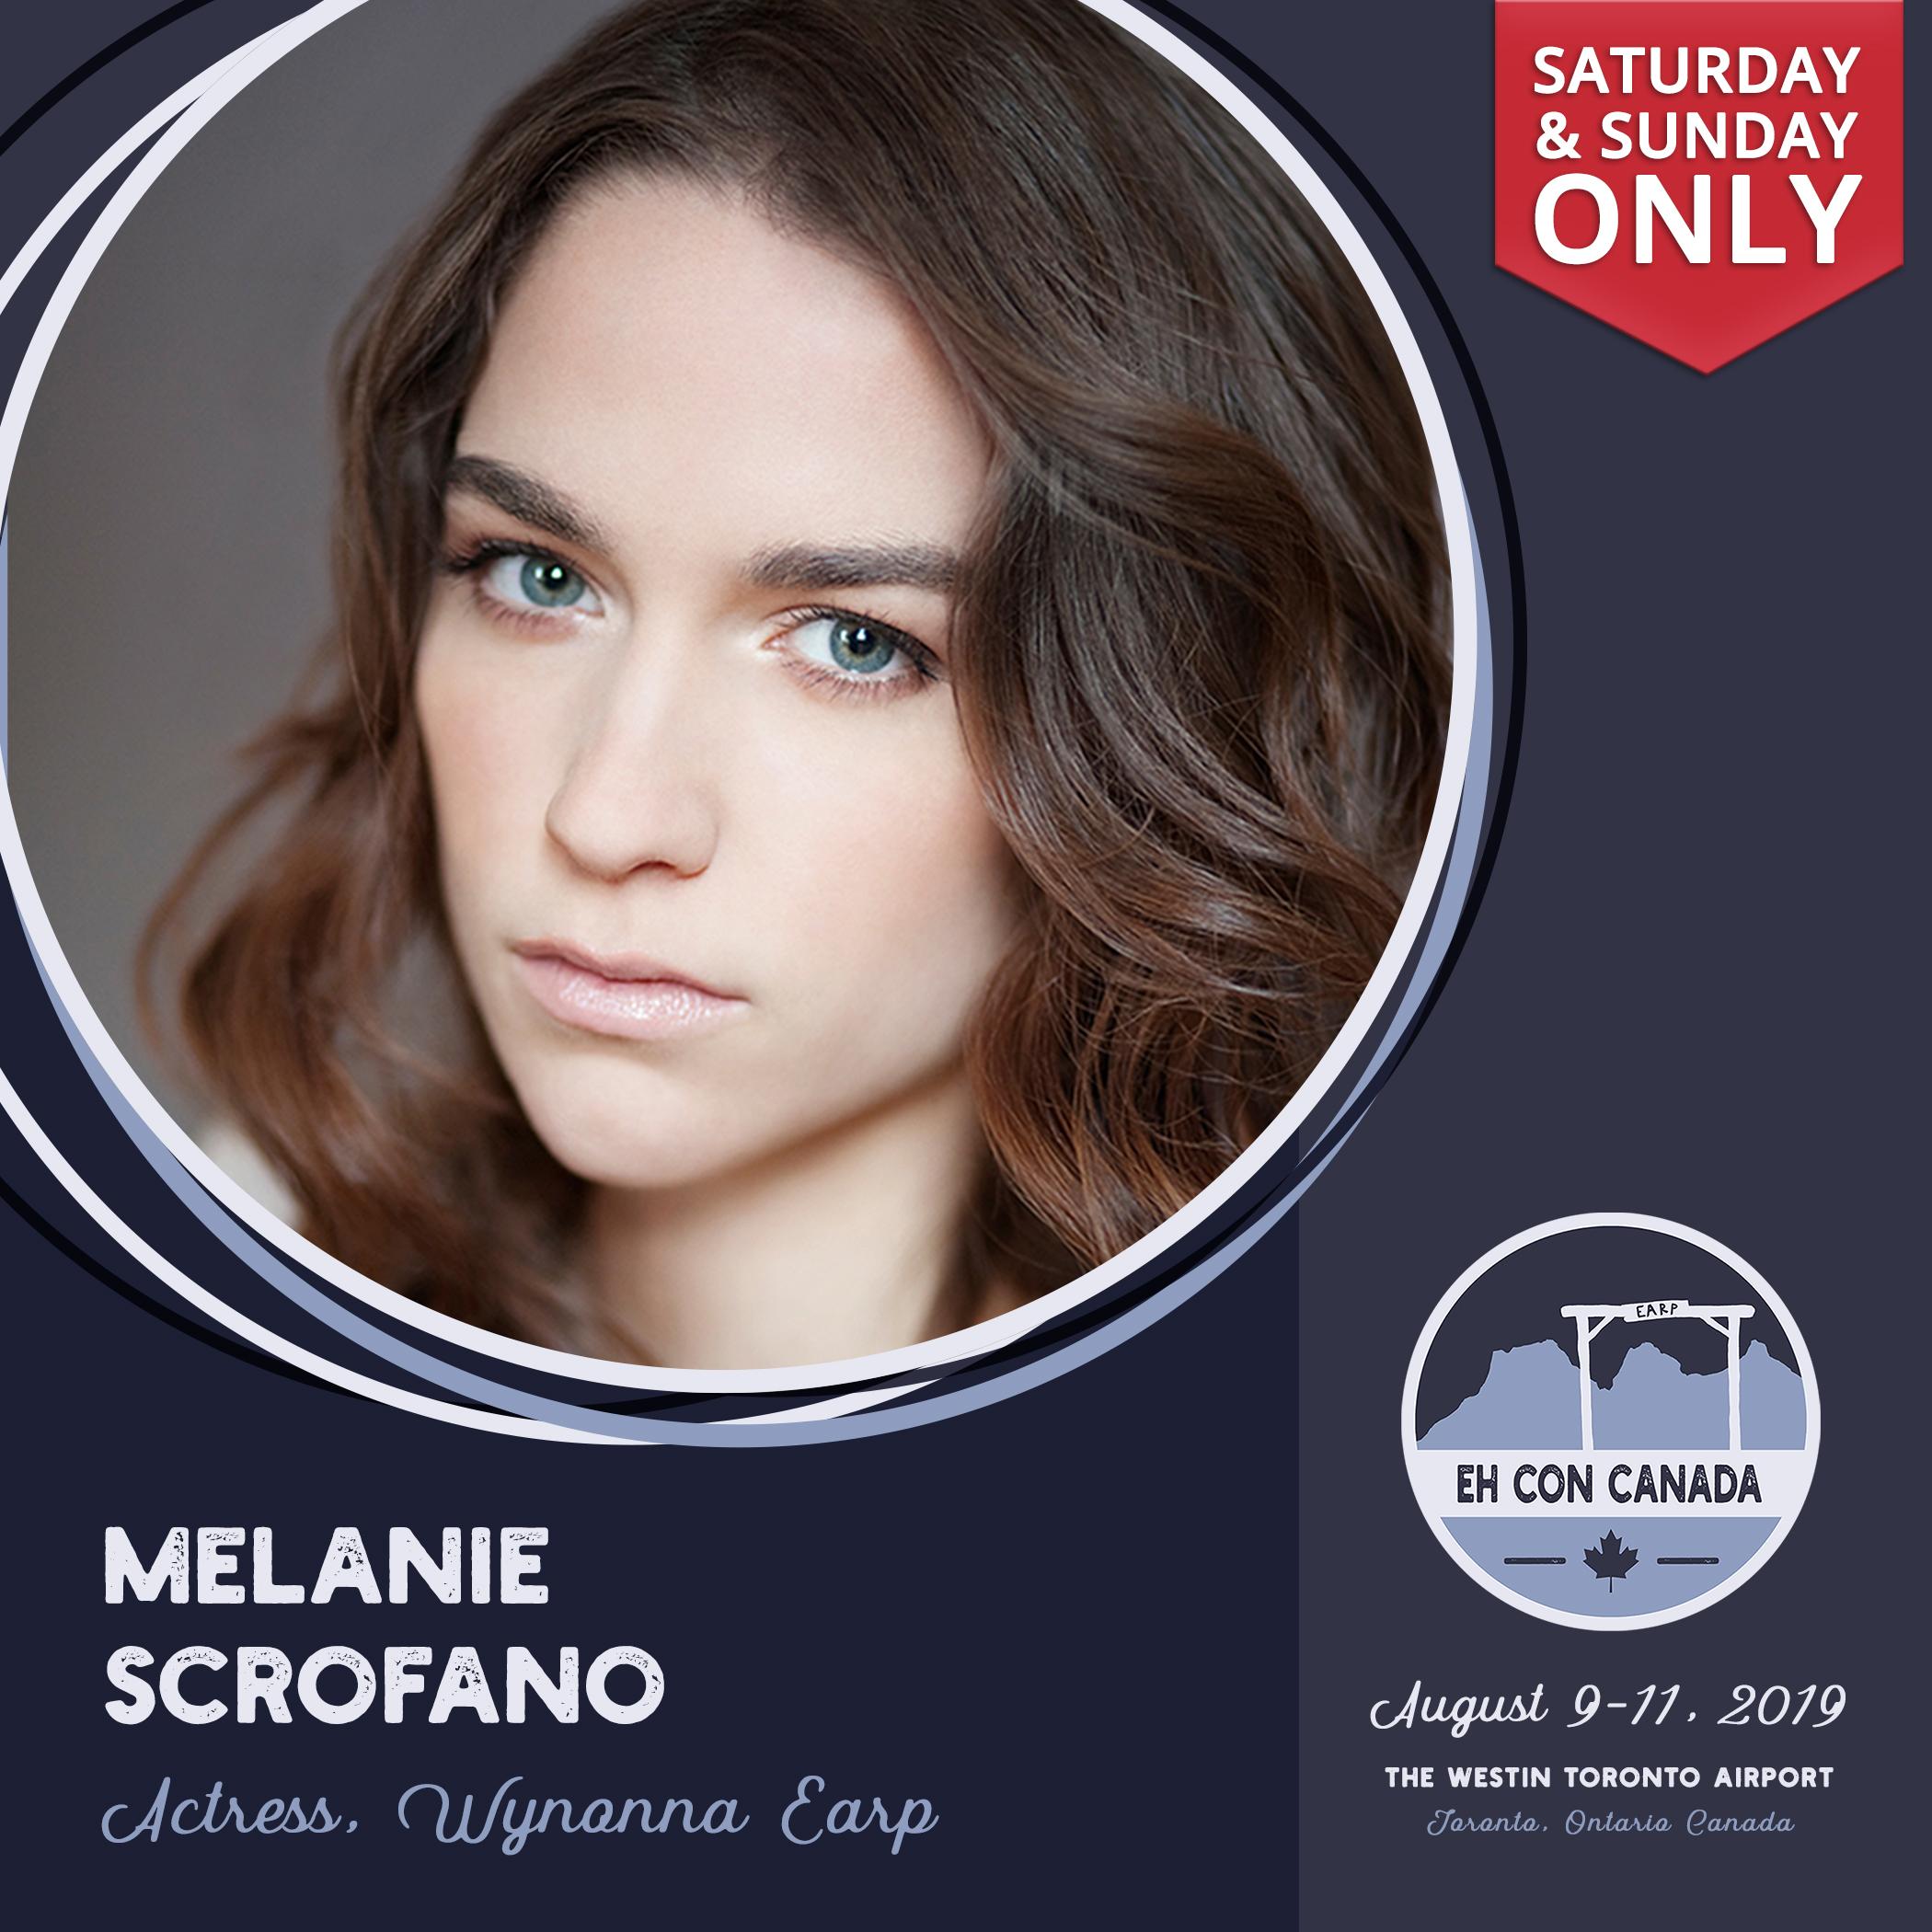 Melanie's Bio